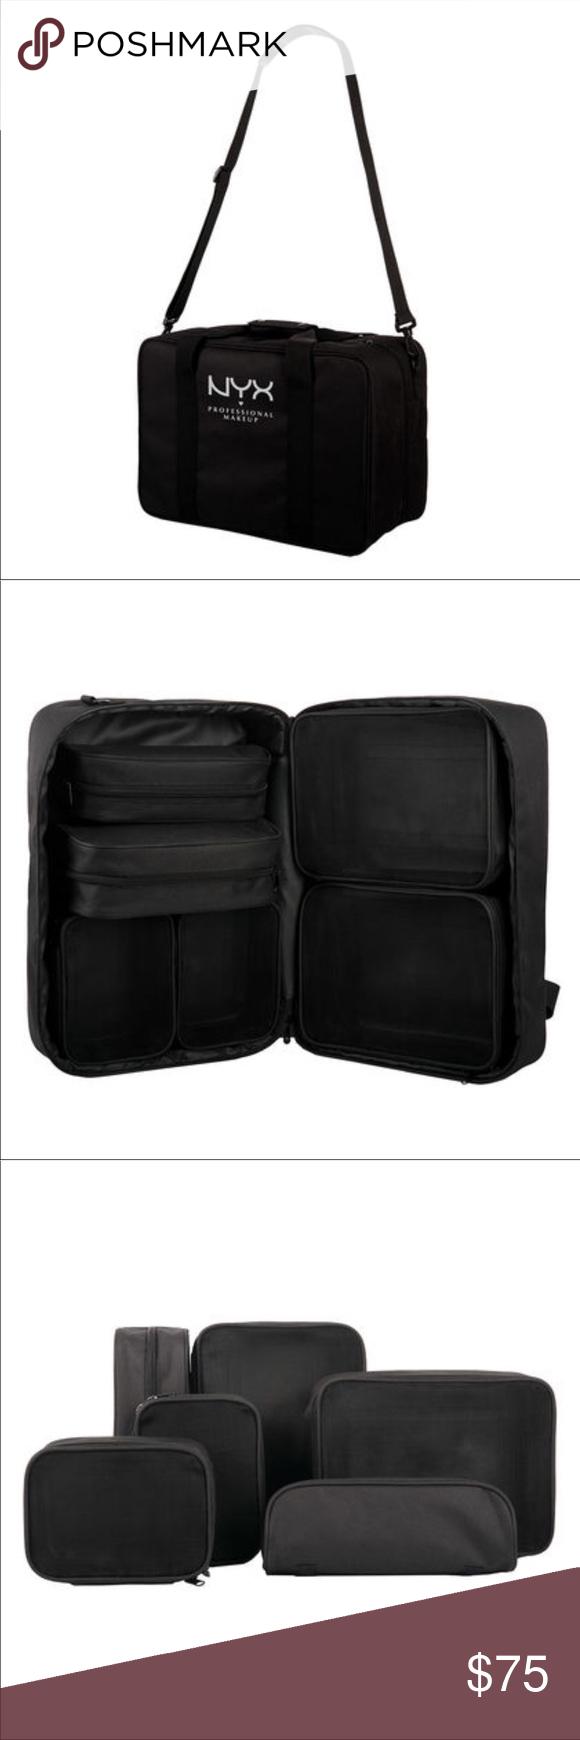 Black NYX Large Carry On Organizer Makeup Case Bag NWT